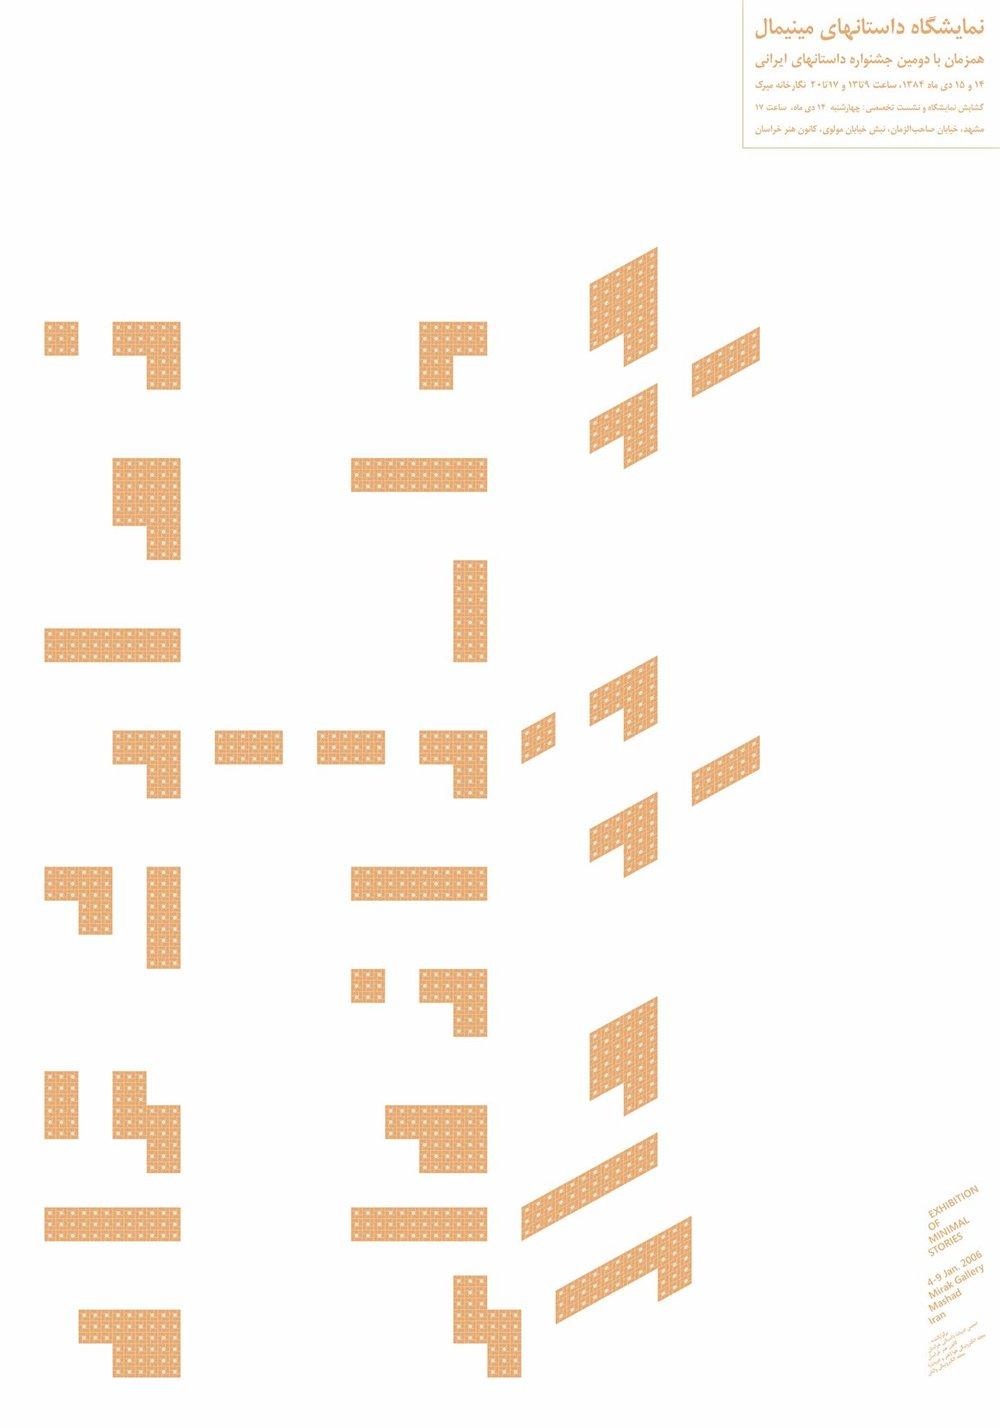 iman-raad-2005-20.jpg